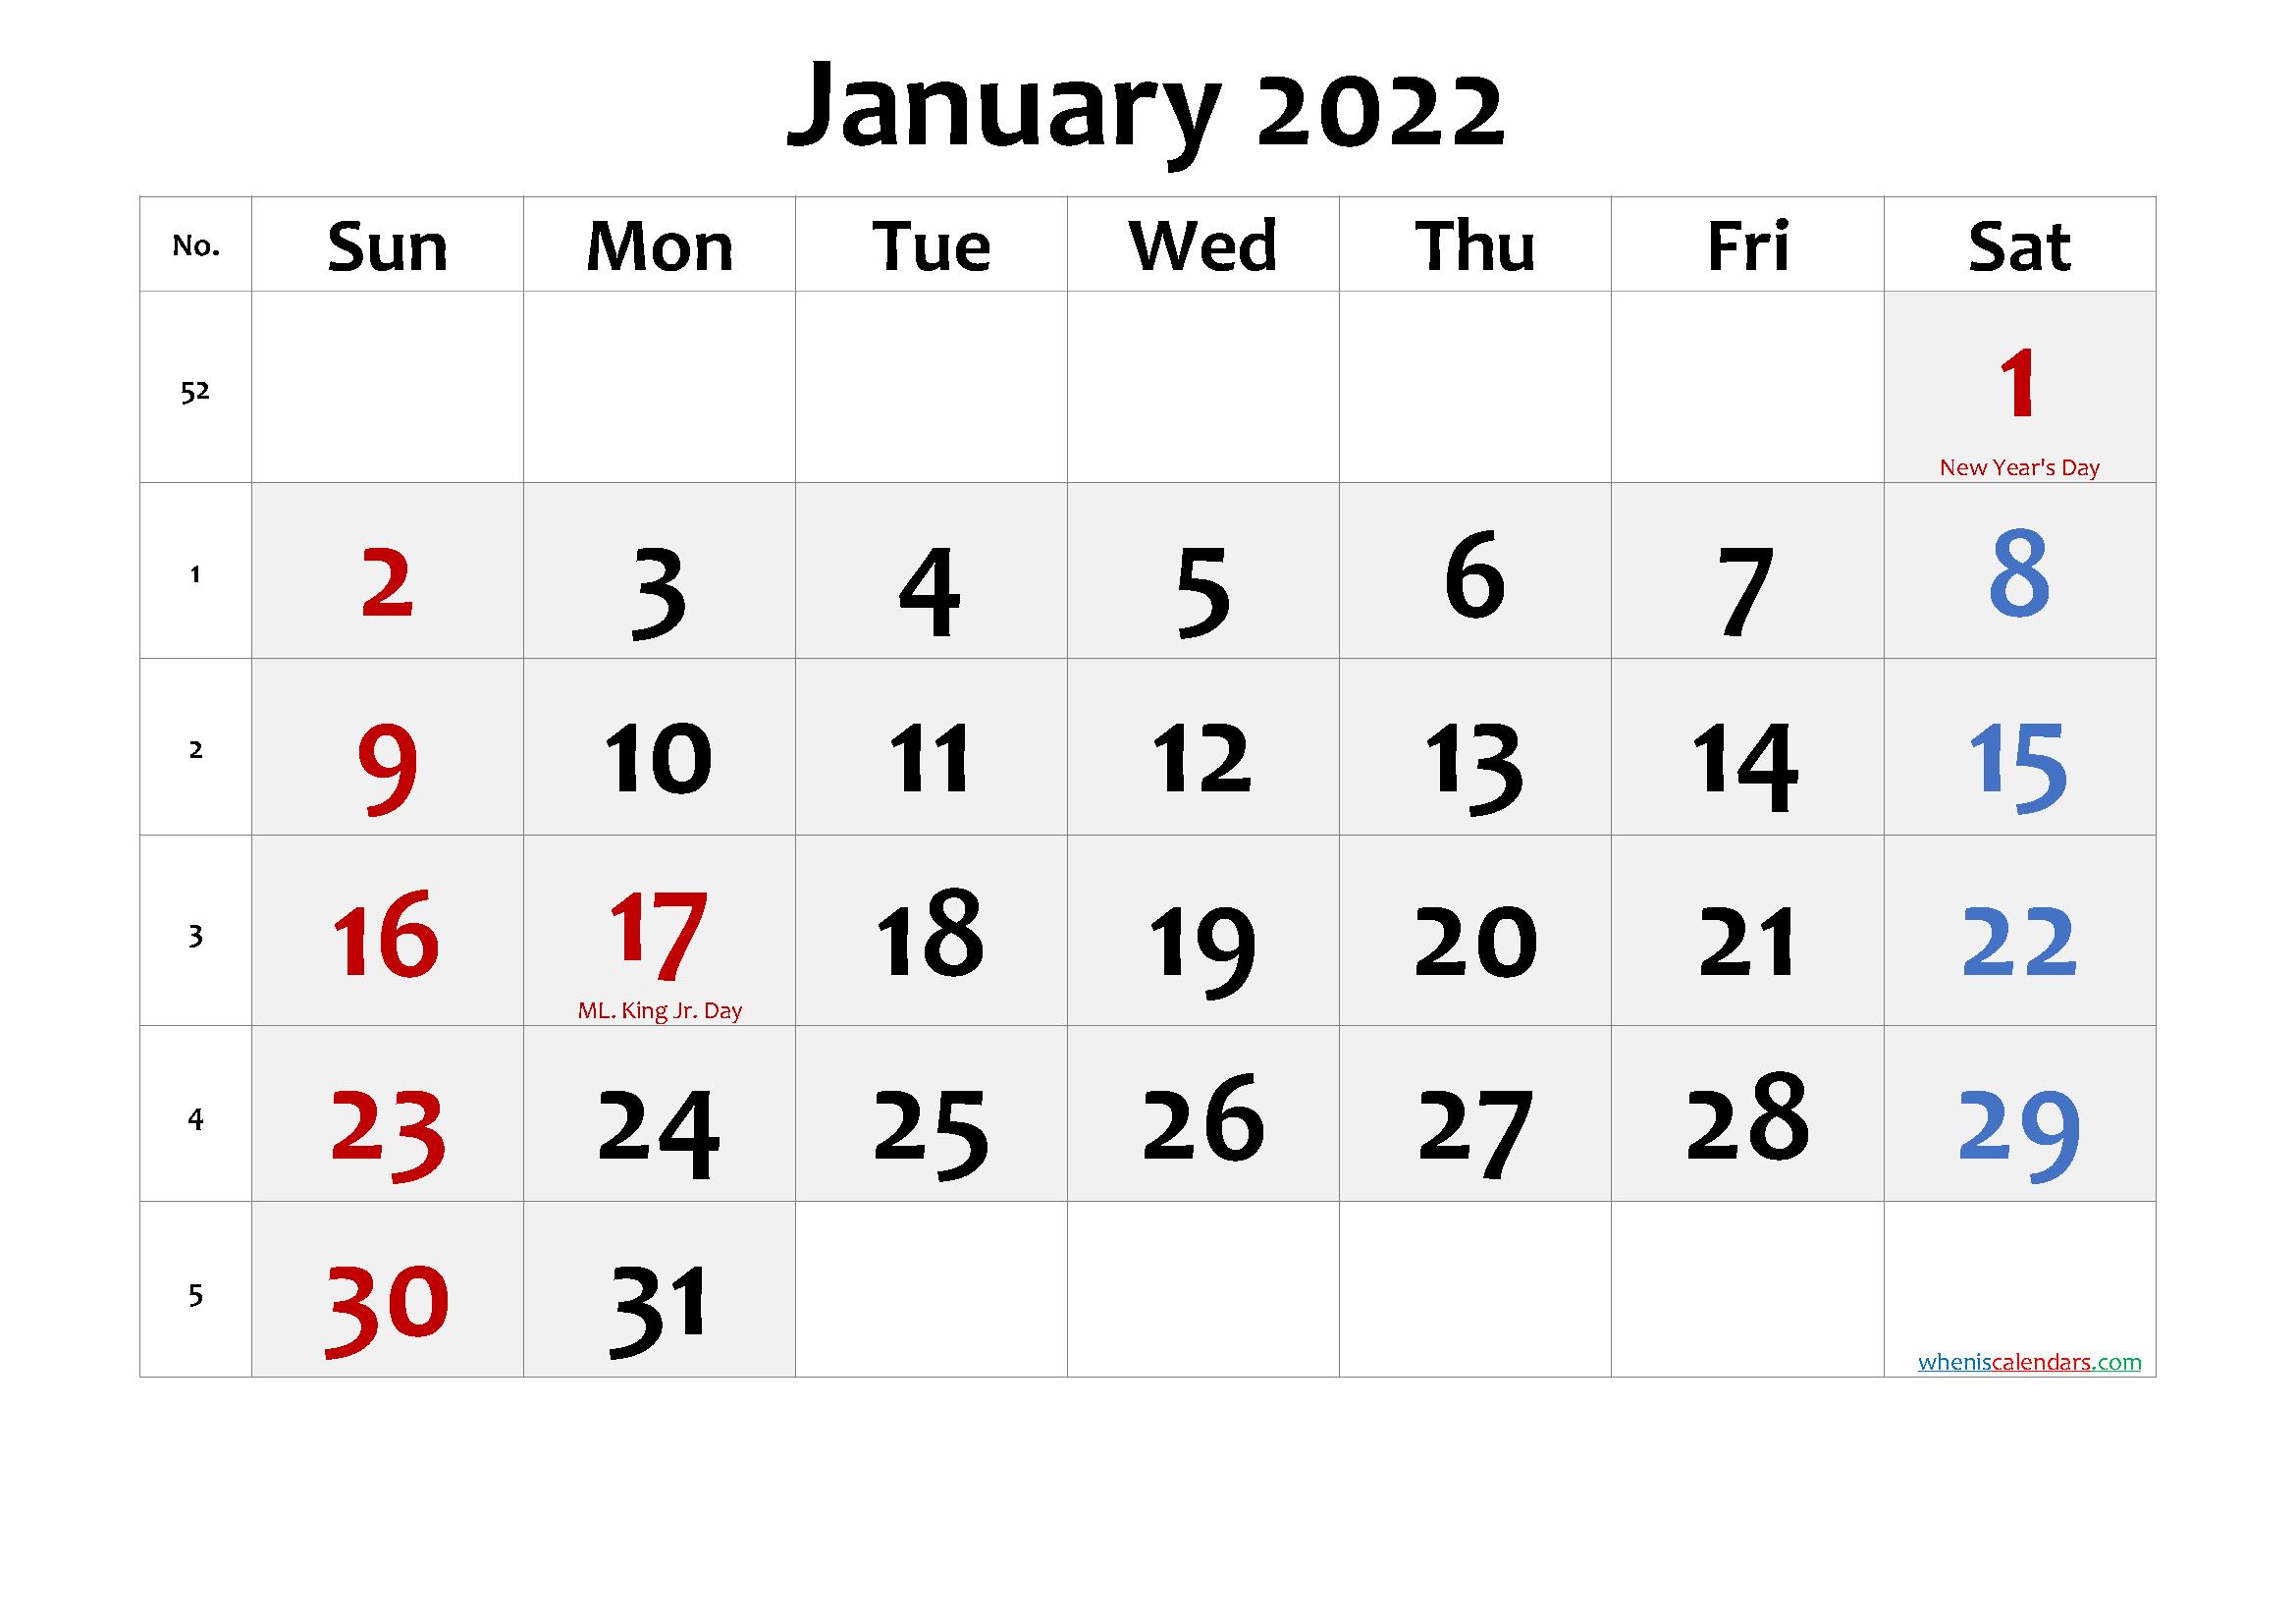 Free Printable January 2022 Calendar With Holidays - Free in Free Printable Printable Pdf January 2022 Calendar Photo